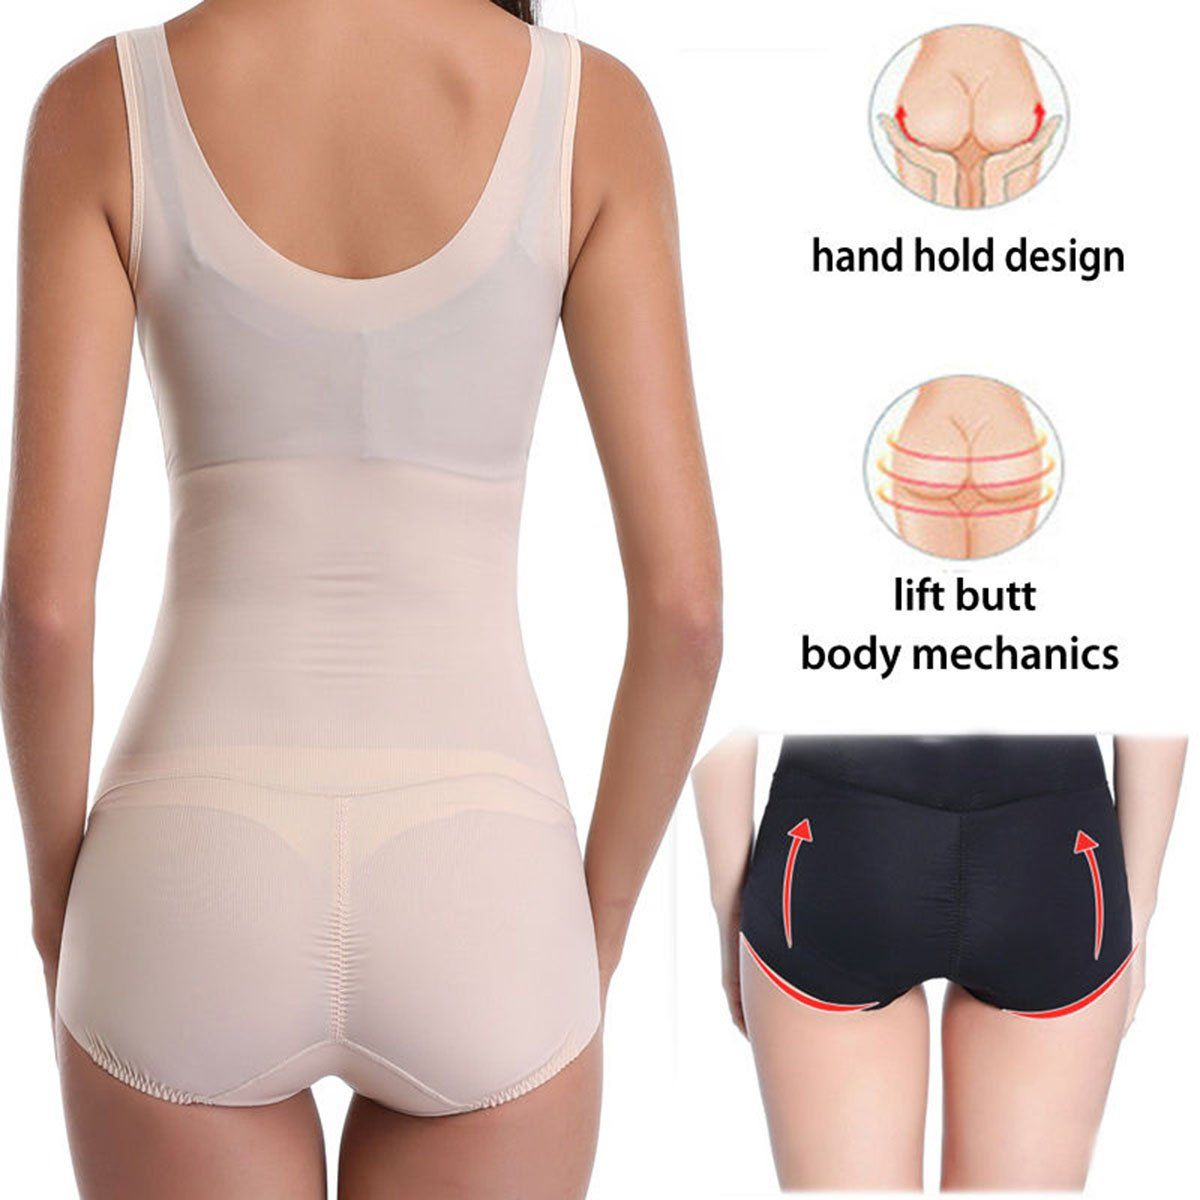 6646a73a547 MISS MOLY Women Full Body Shaper Waist Training Black Bodysuit Shapewear  Underbust Corset Beige XL